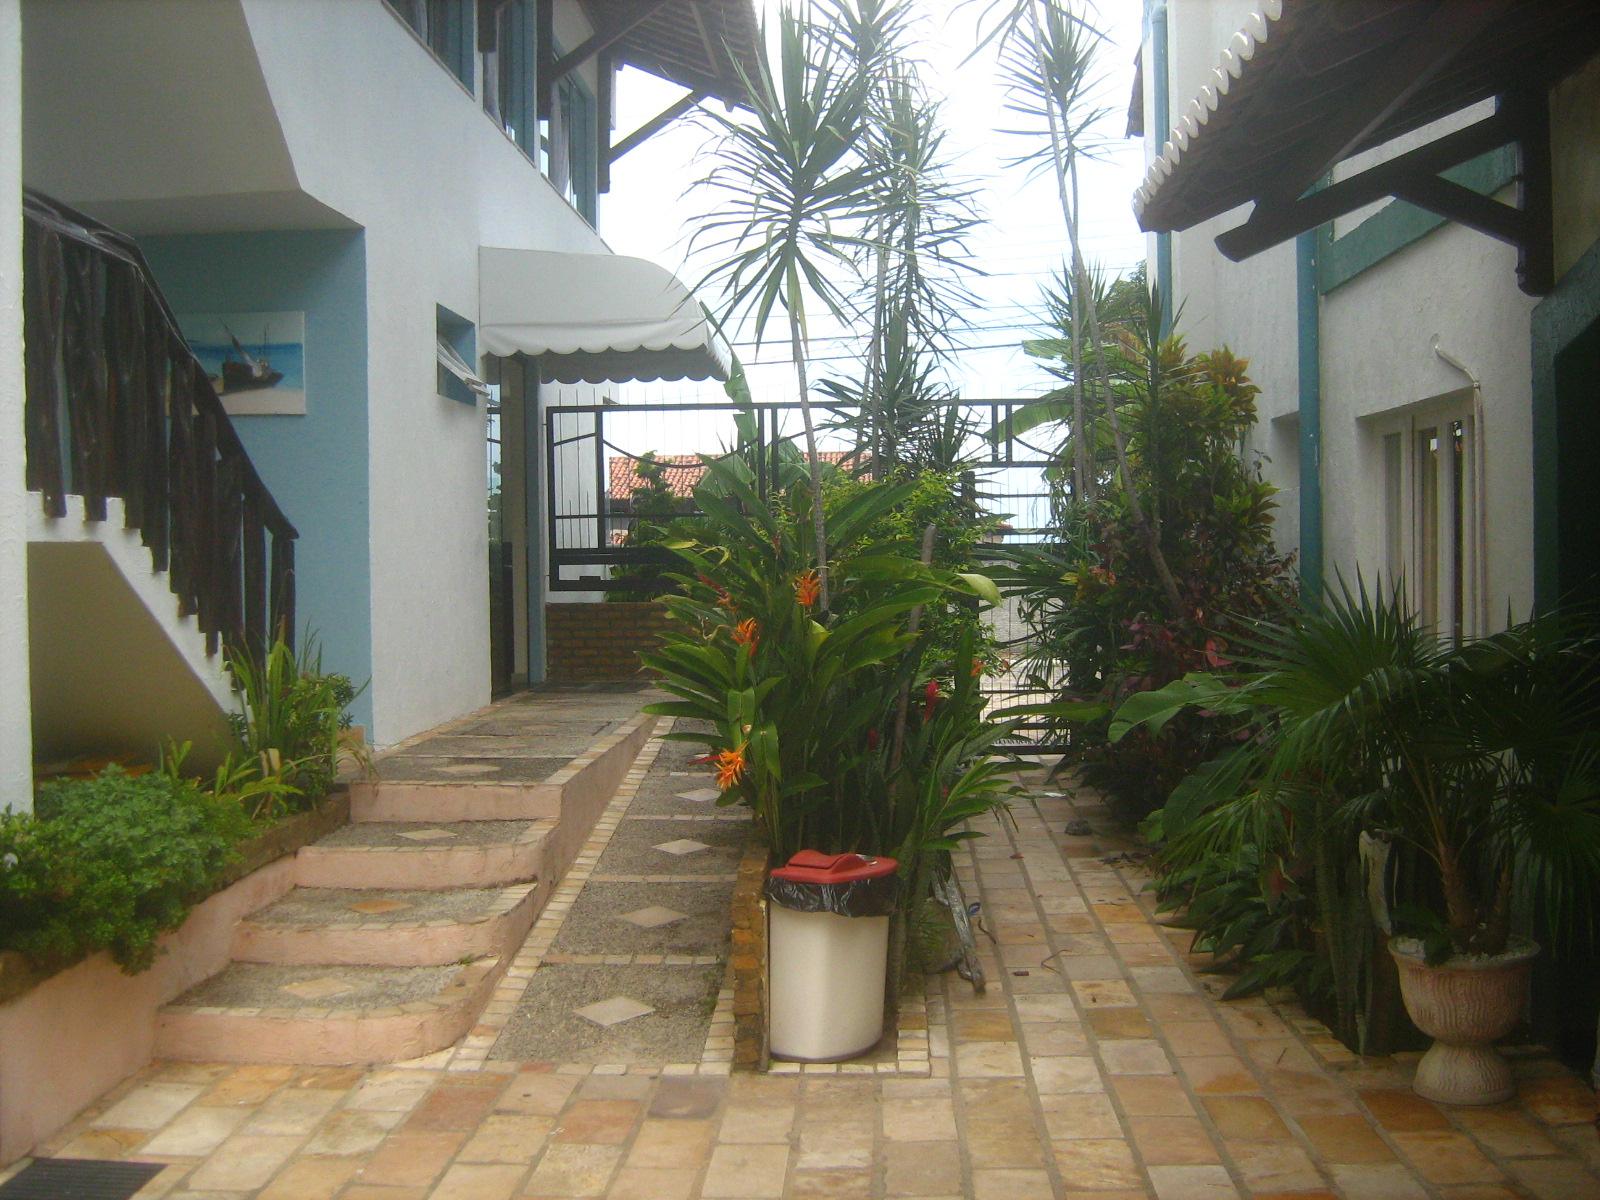 #634C2D VIAJANTE ESPECIAL: Pousada Areia de Ouro Natal RN 1600x1200 px piso banheiro idoso